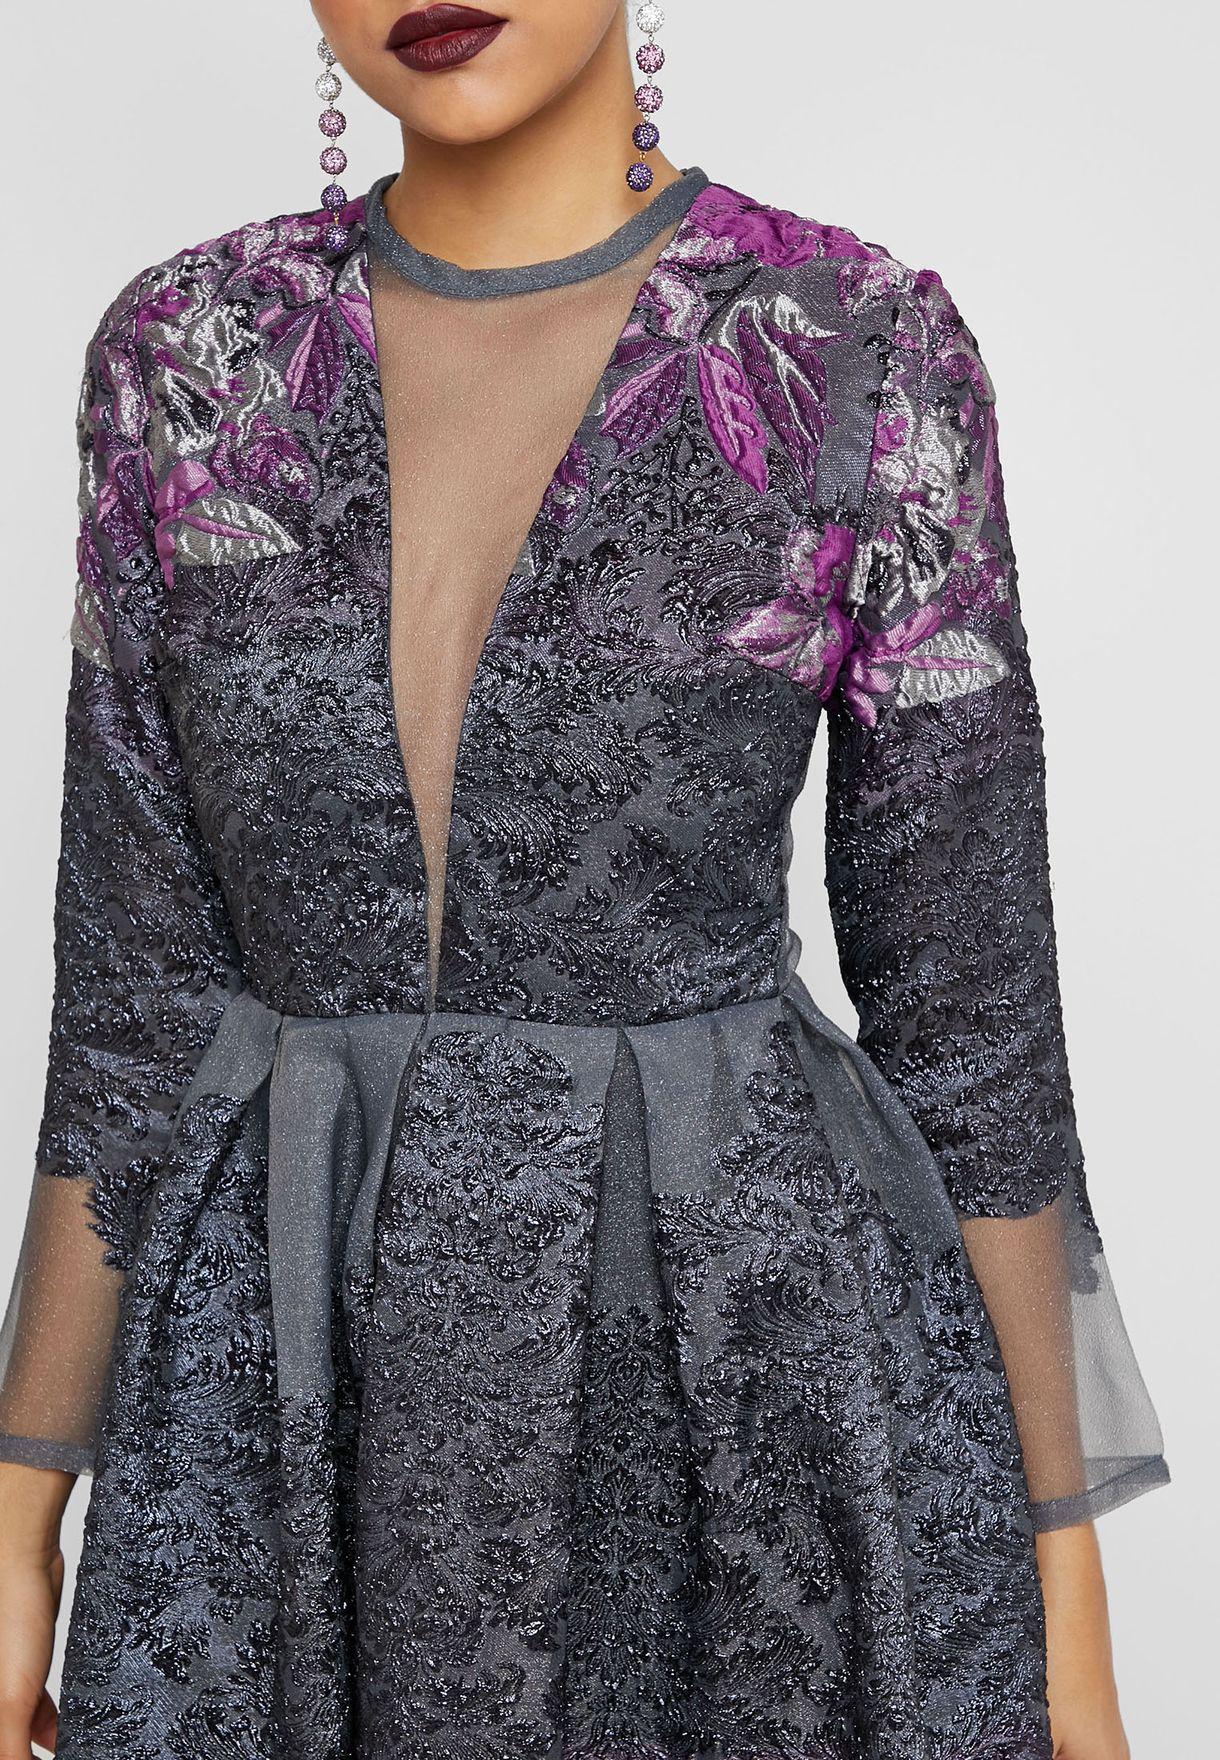 Plunge Illusion Floral Embossed Dress